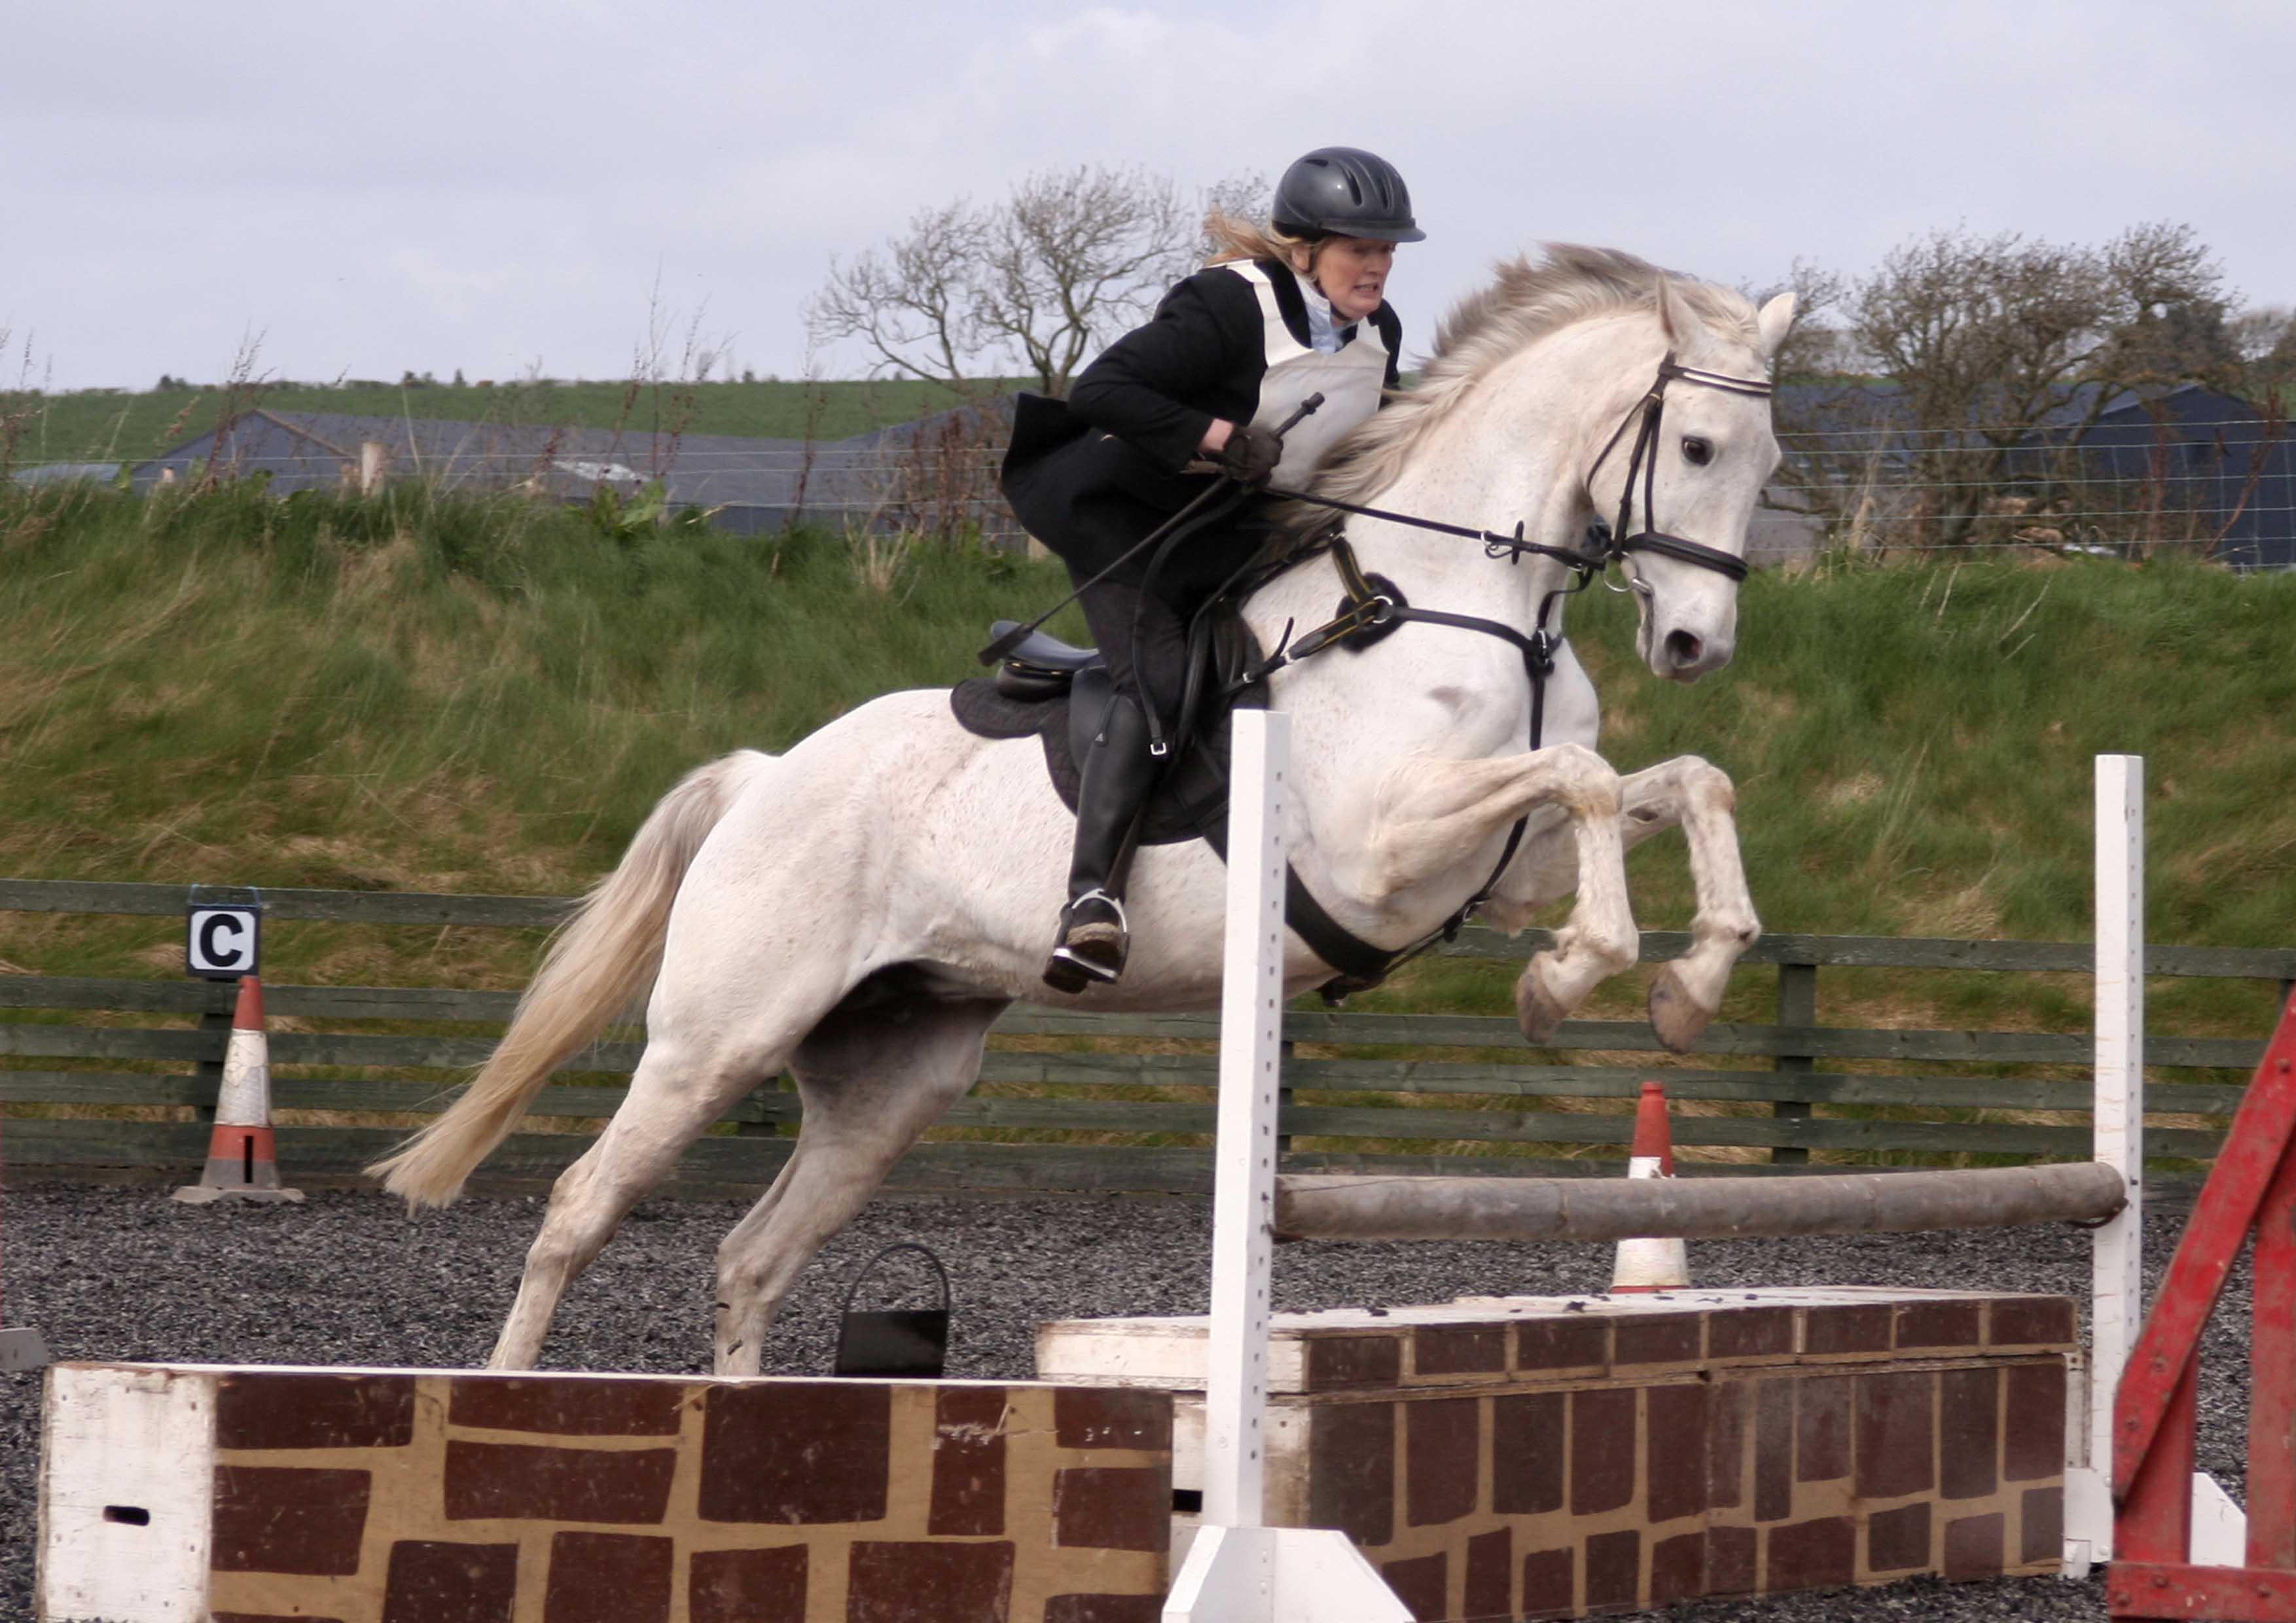 Edinburgh Amp District Riding Club Photo Gallery